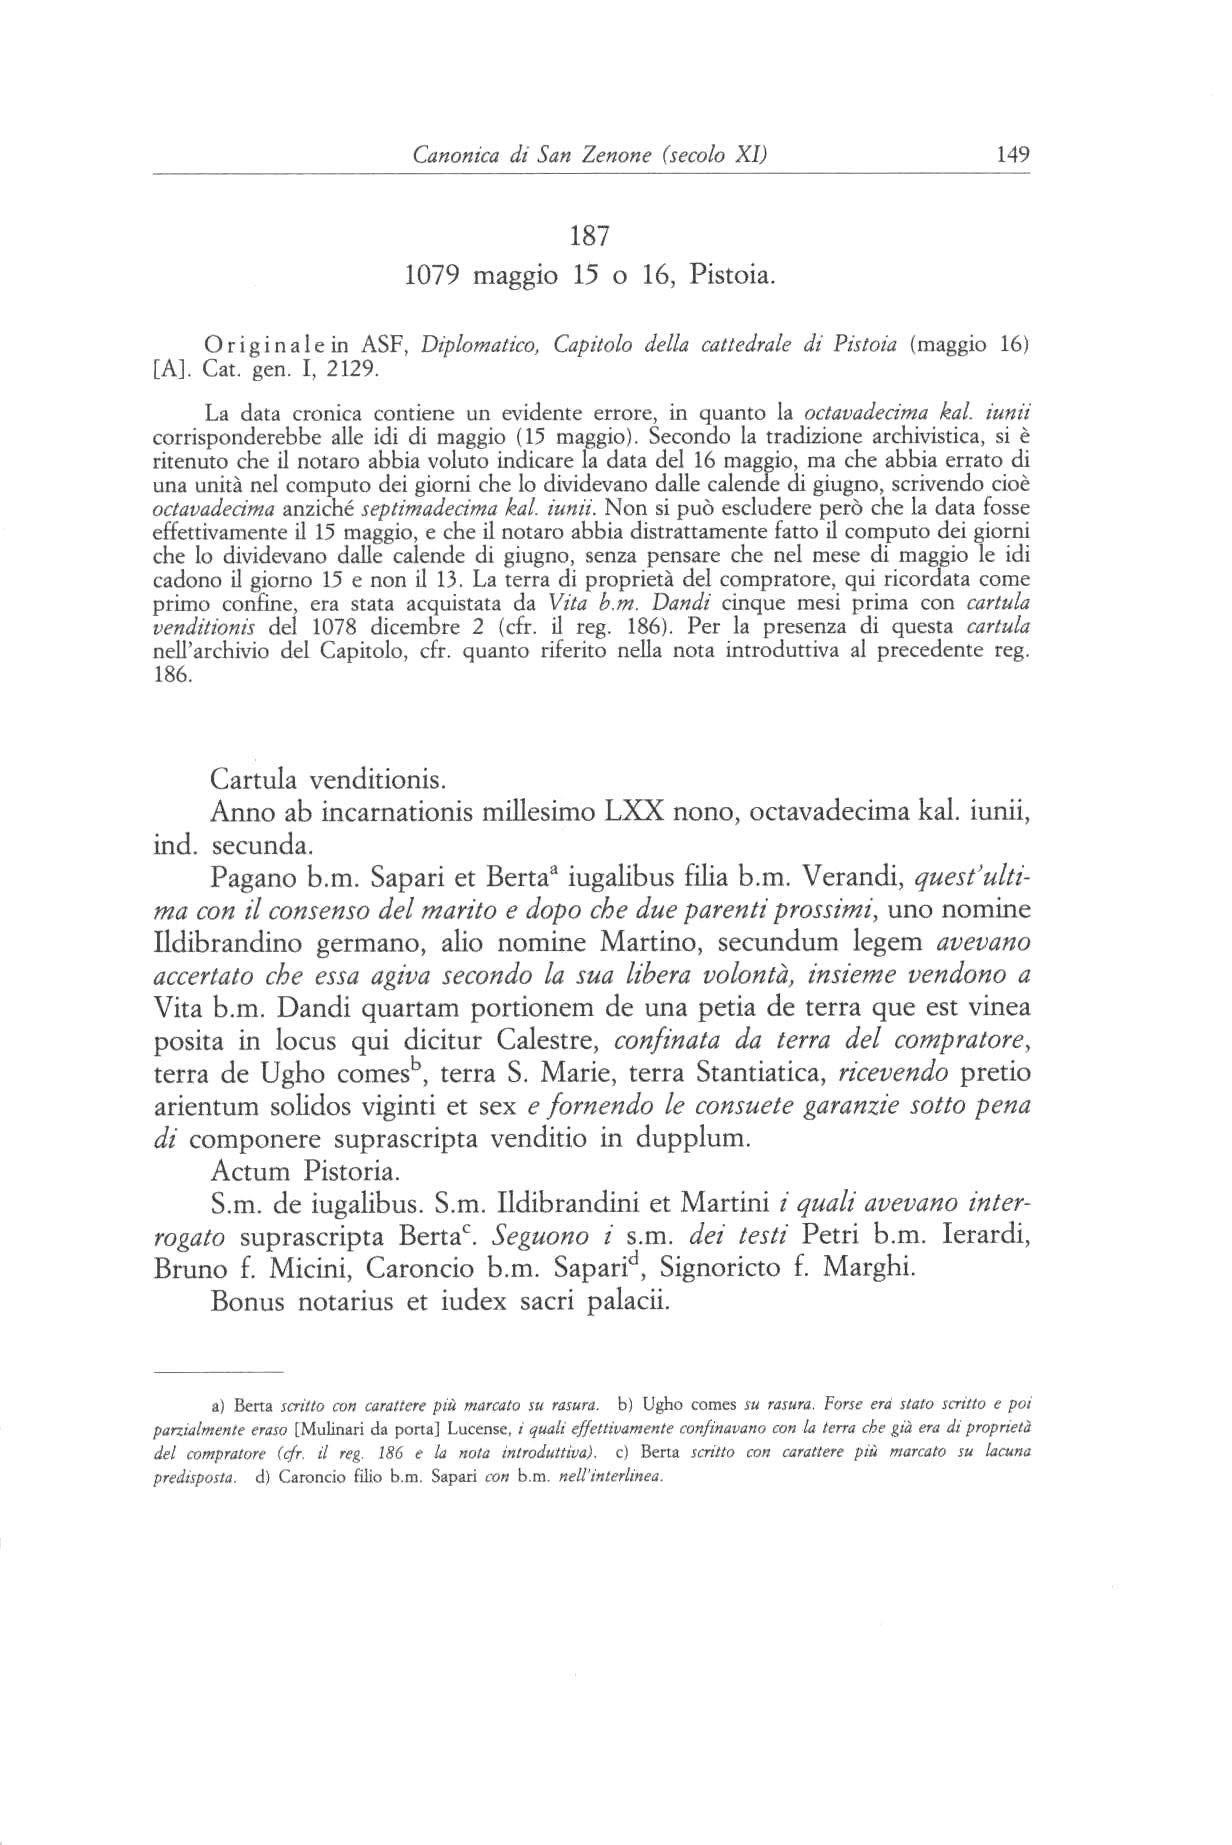 Canonica S. Zenone XI 0149.jpg